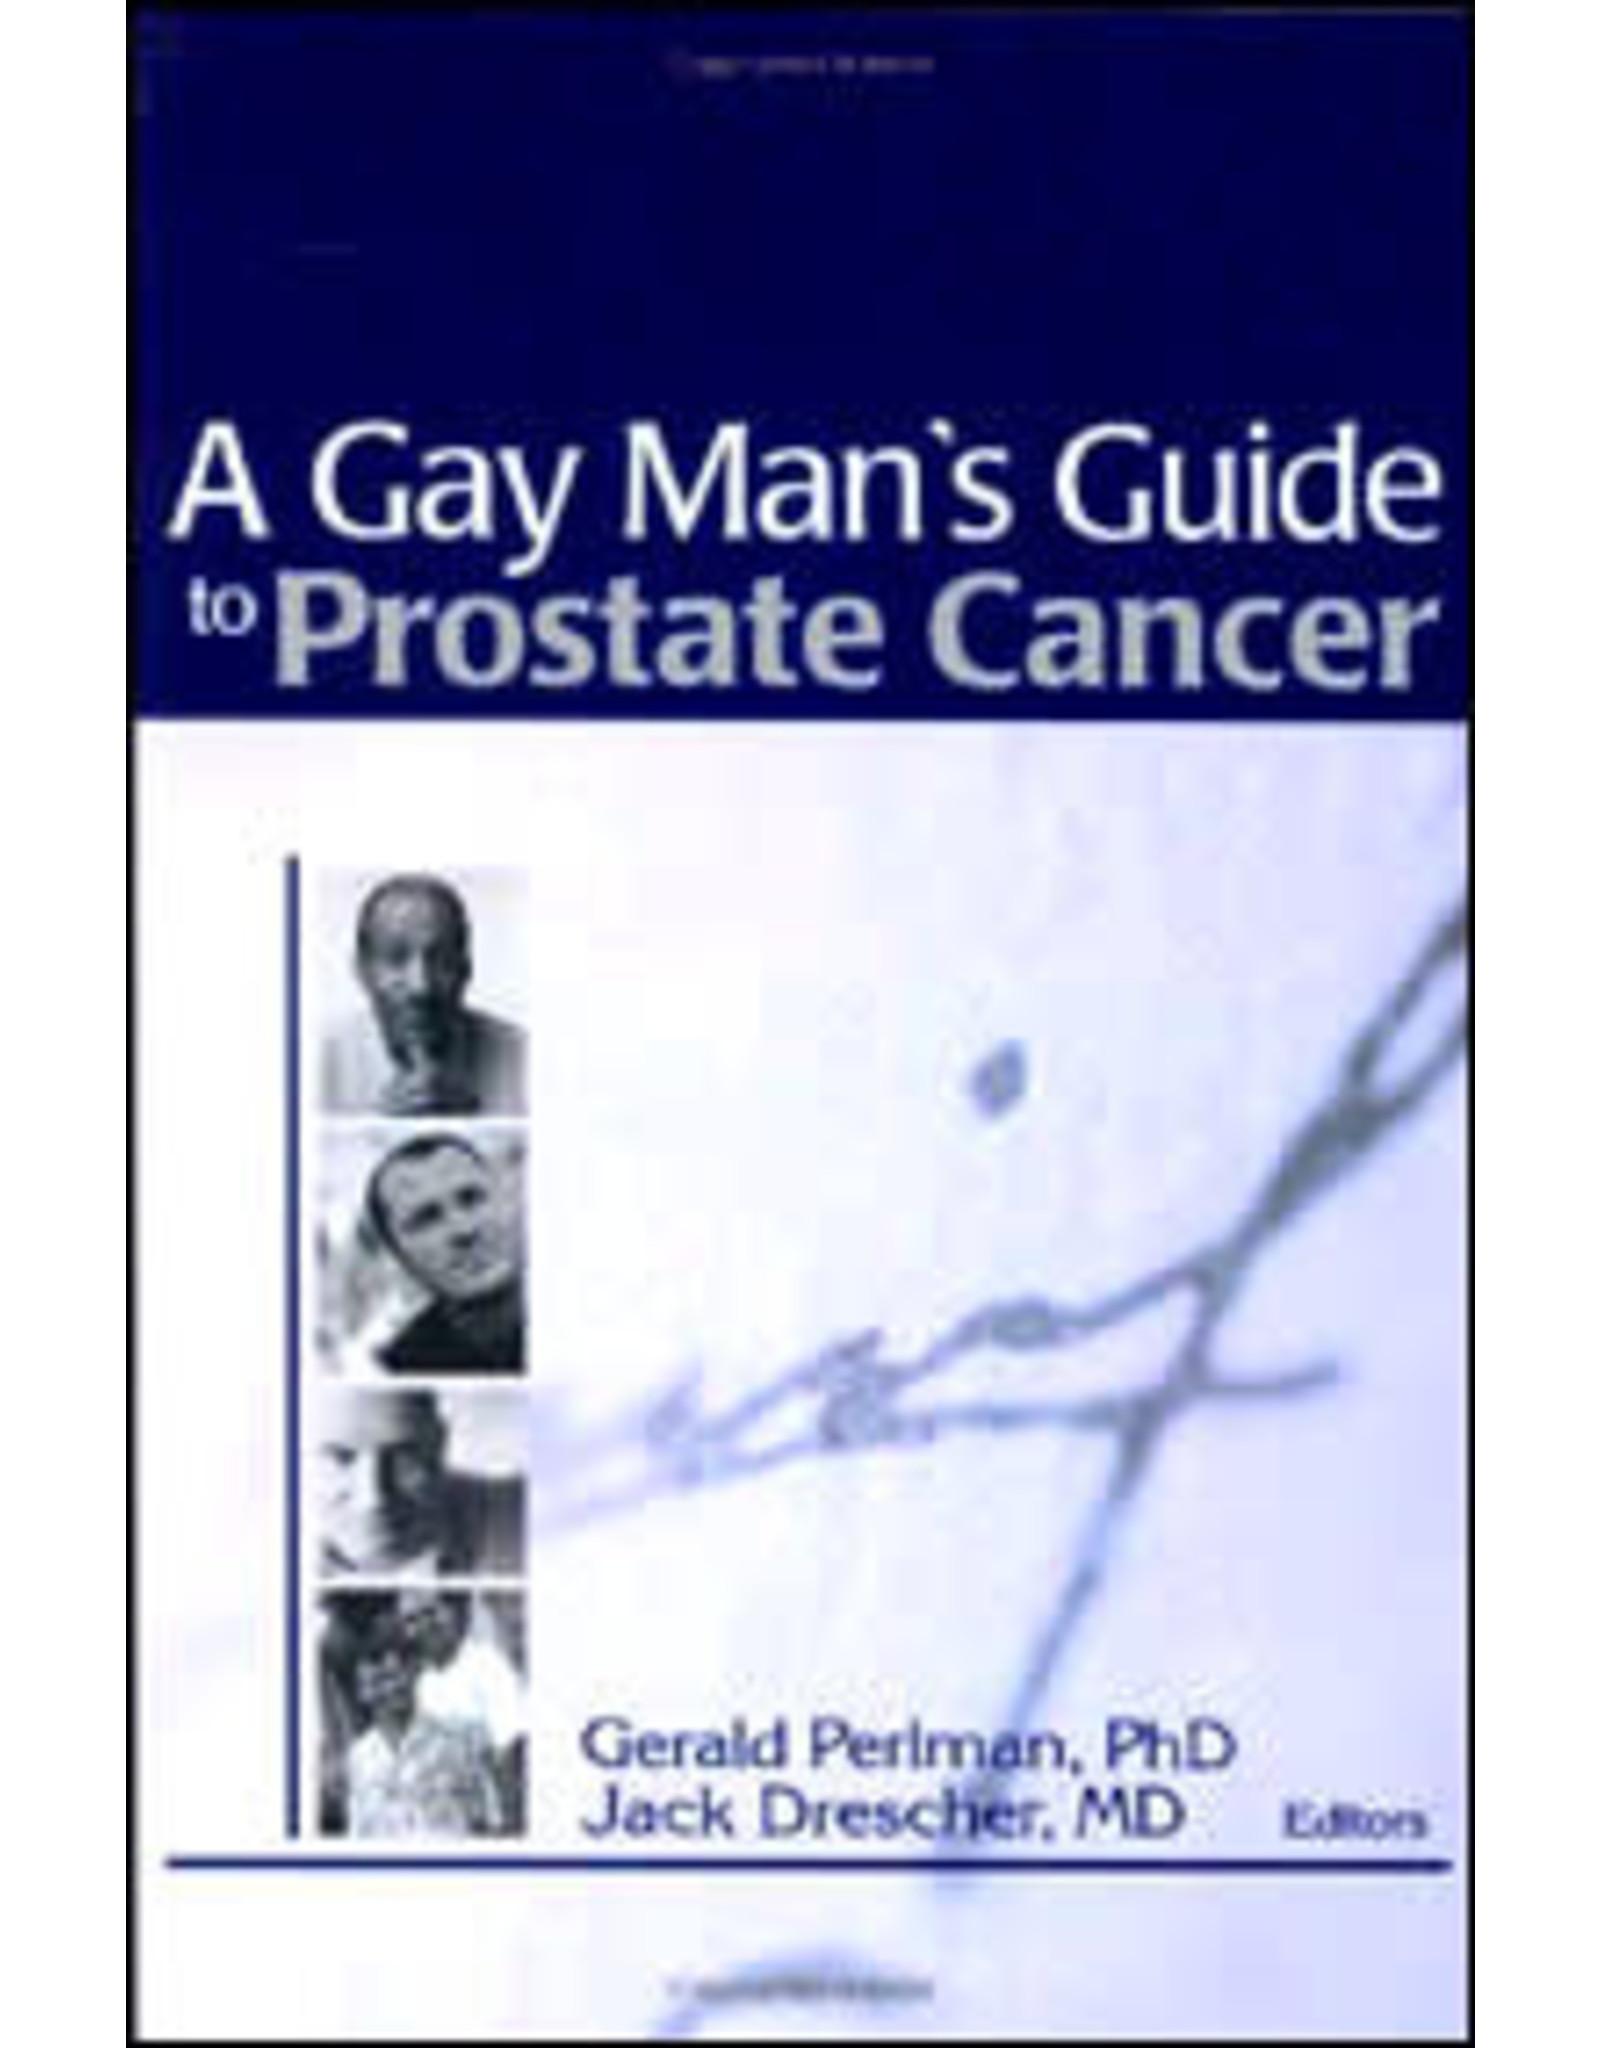 COCOBOYZ.COM A GAY MANS GUIDE TO PROSTATE CANCER,